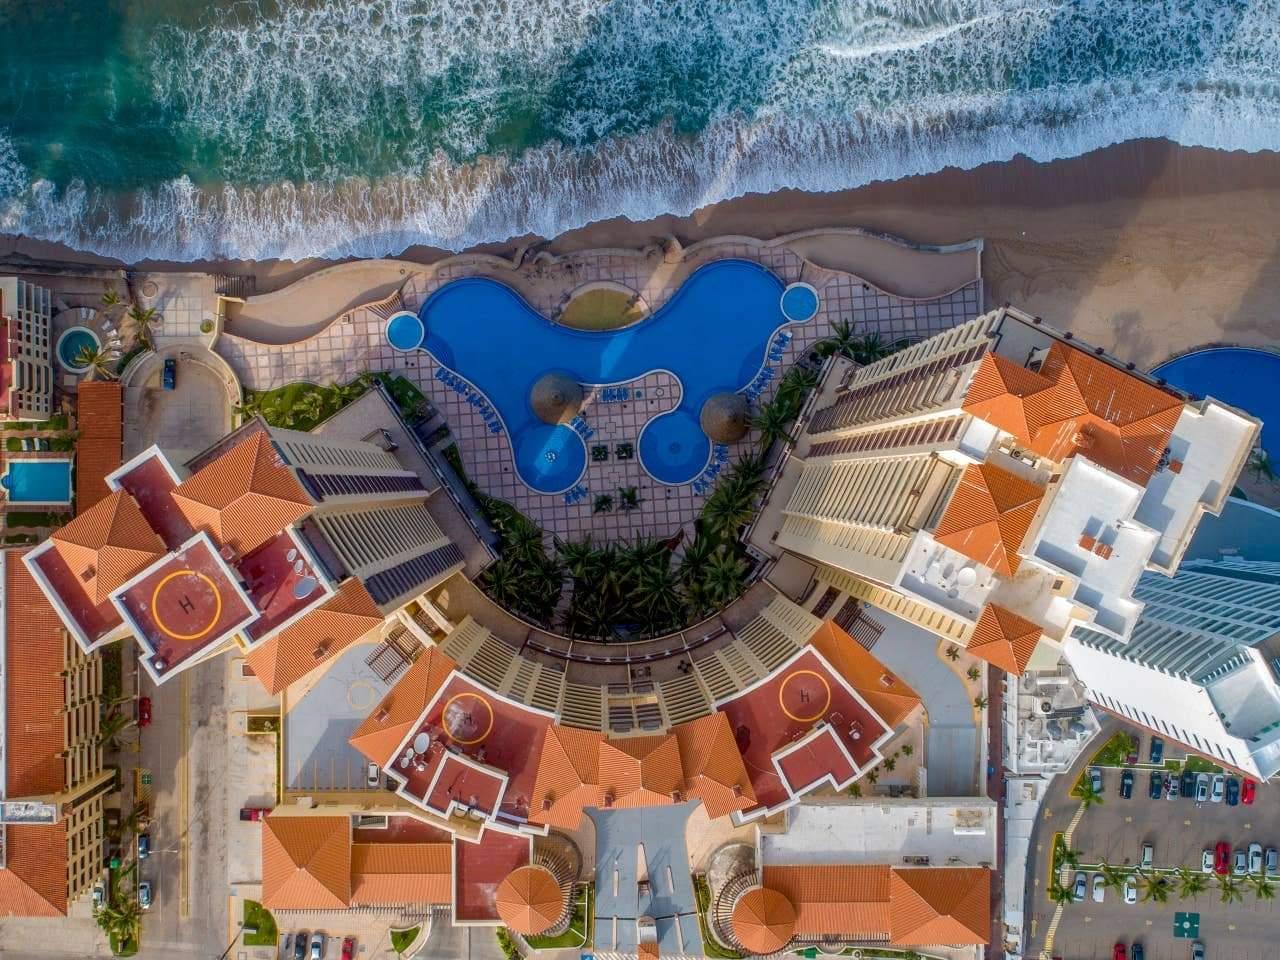 Aerial view of Gavias Grand.